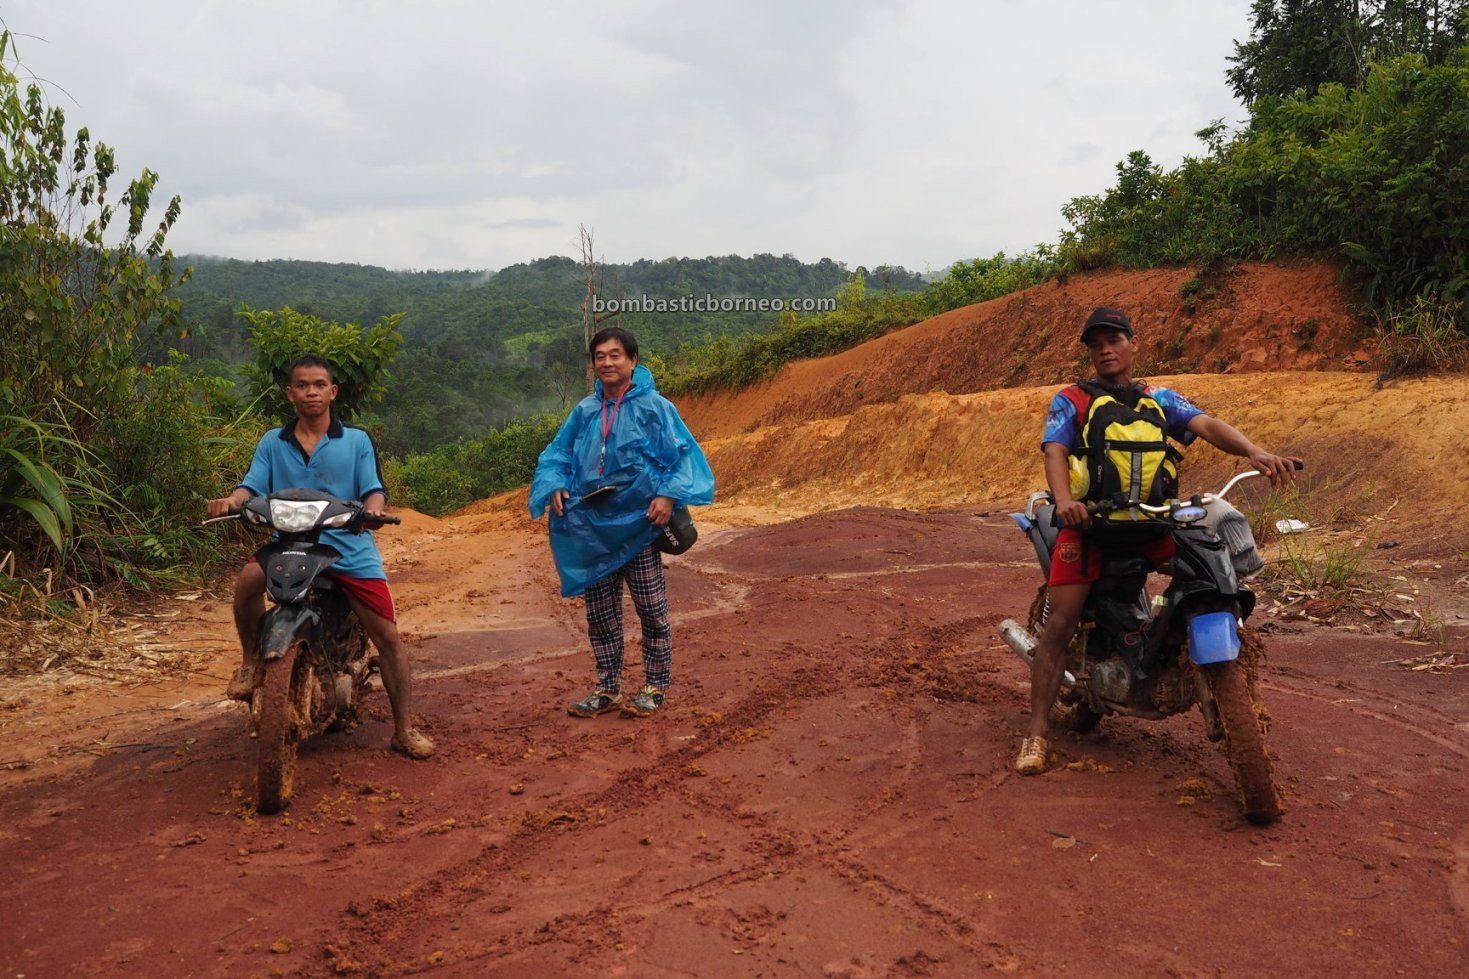 adventure, bike ride, Dusun Kambih, event, Indonesia, Bengkayang, Desa Bengkawan, Seluas, Dayak Kowon't, native, obyek wisata, Tourism, Travel guide, Trans Borneo, West Kalimantan